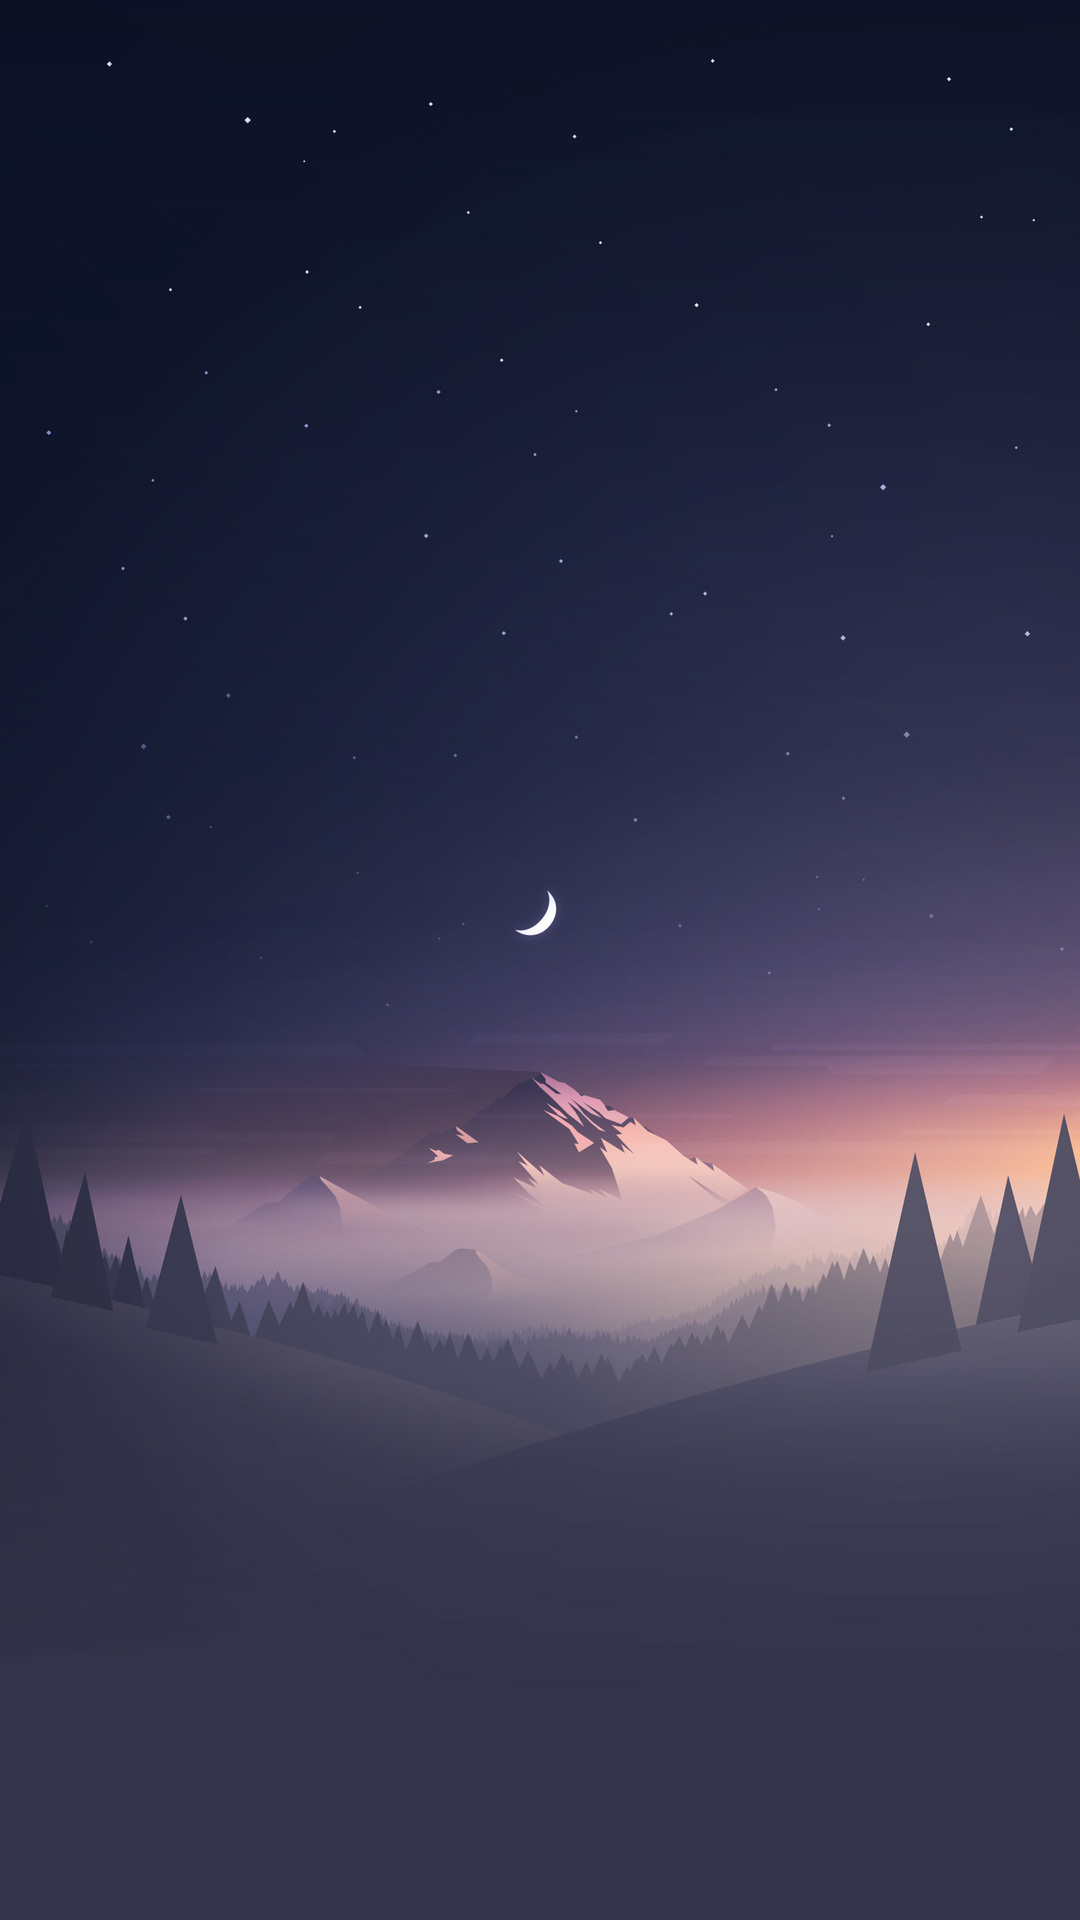 Xiaomi Mi 4 Wallpapers Hd